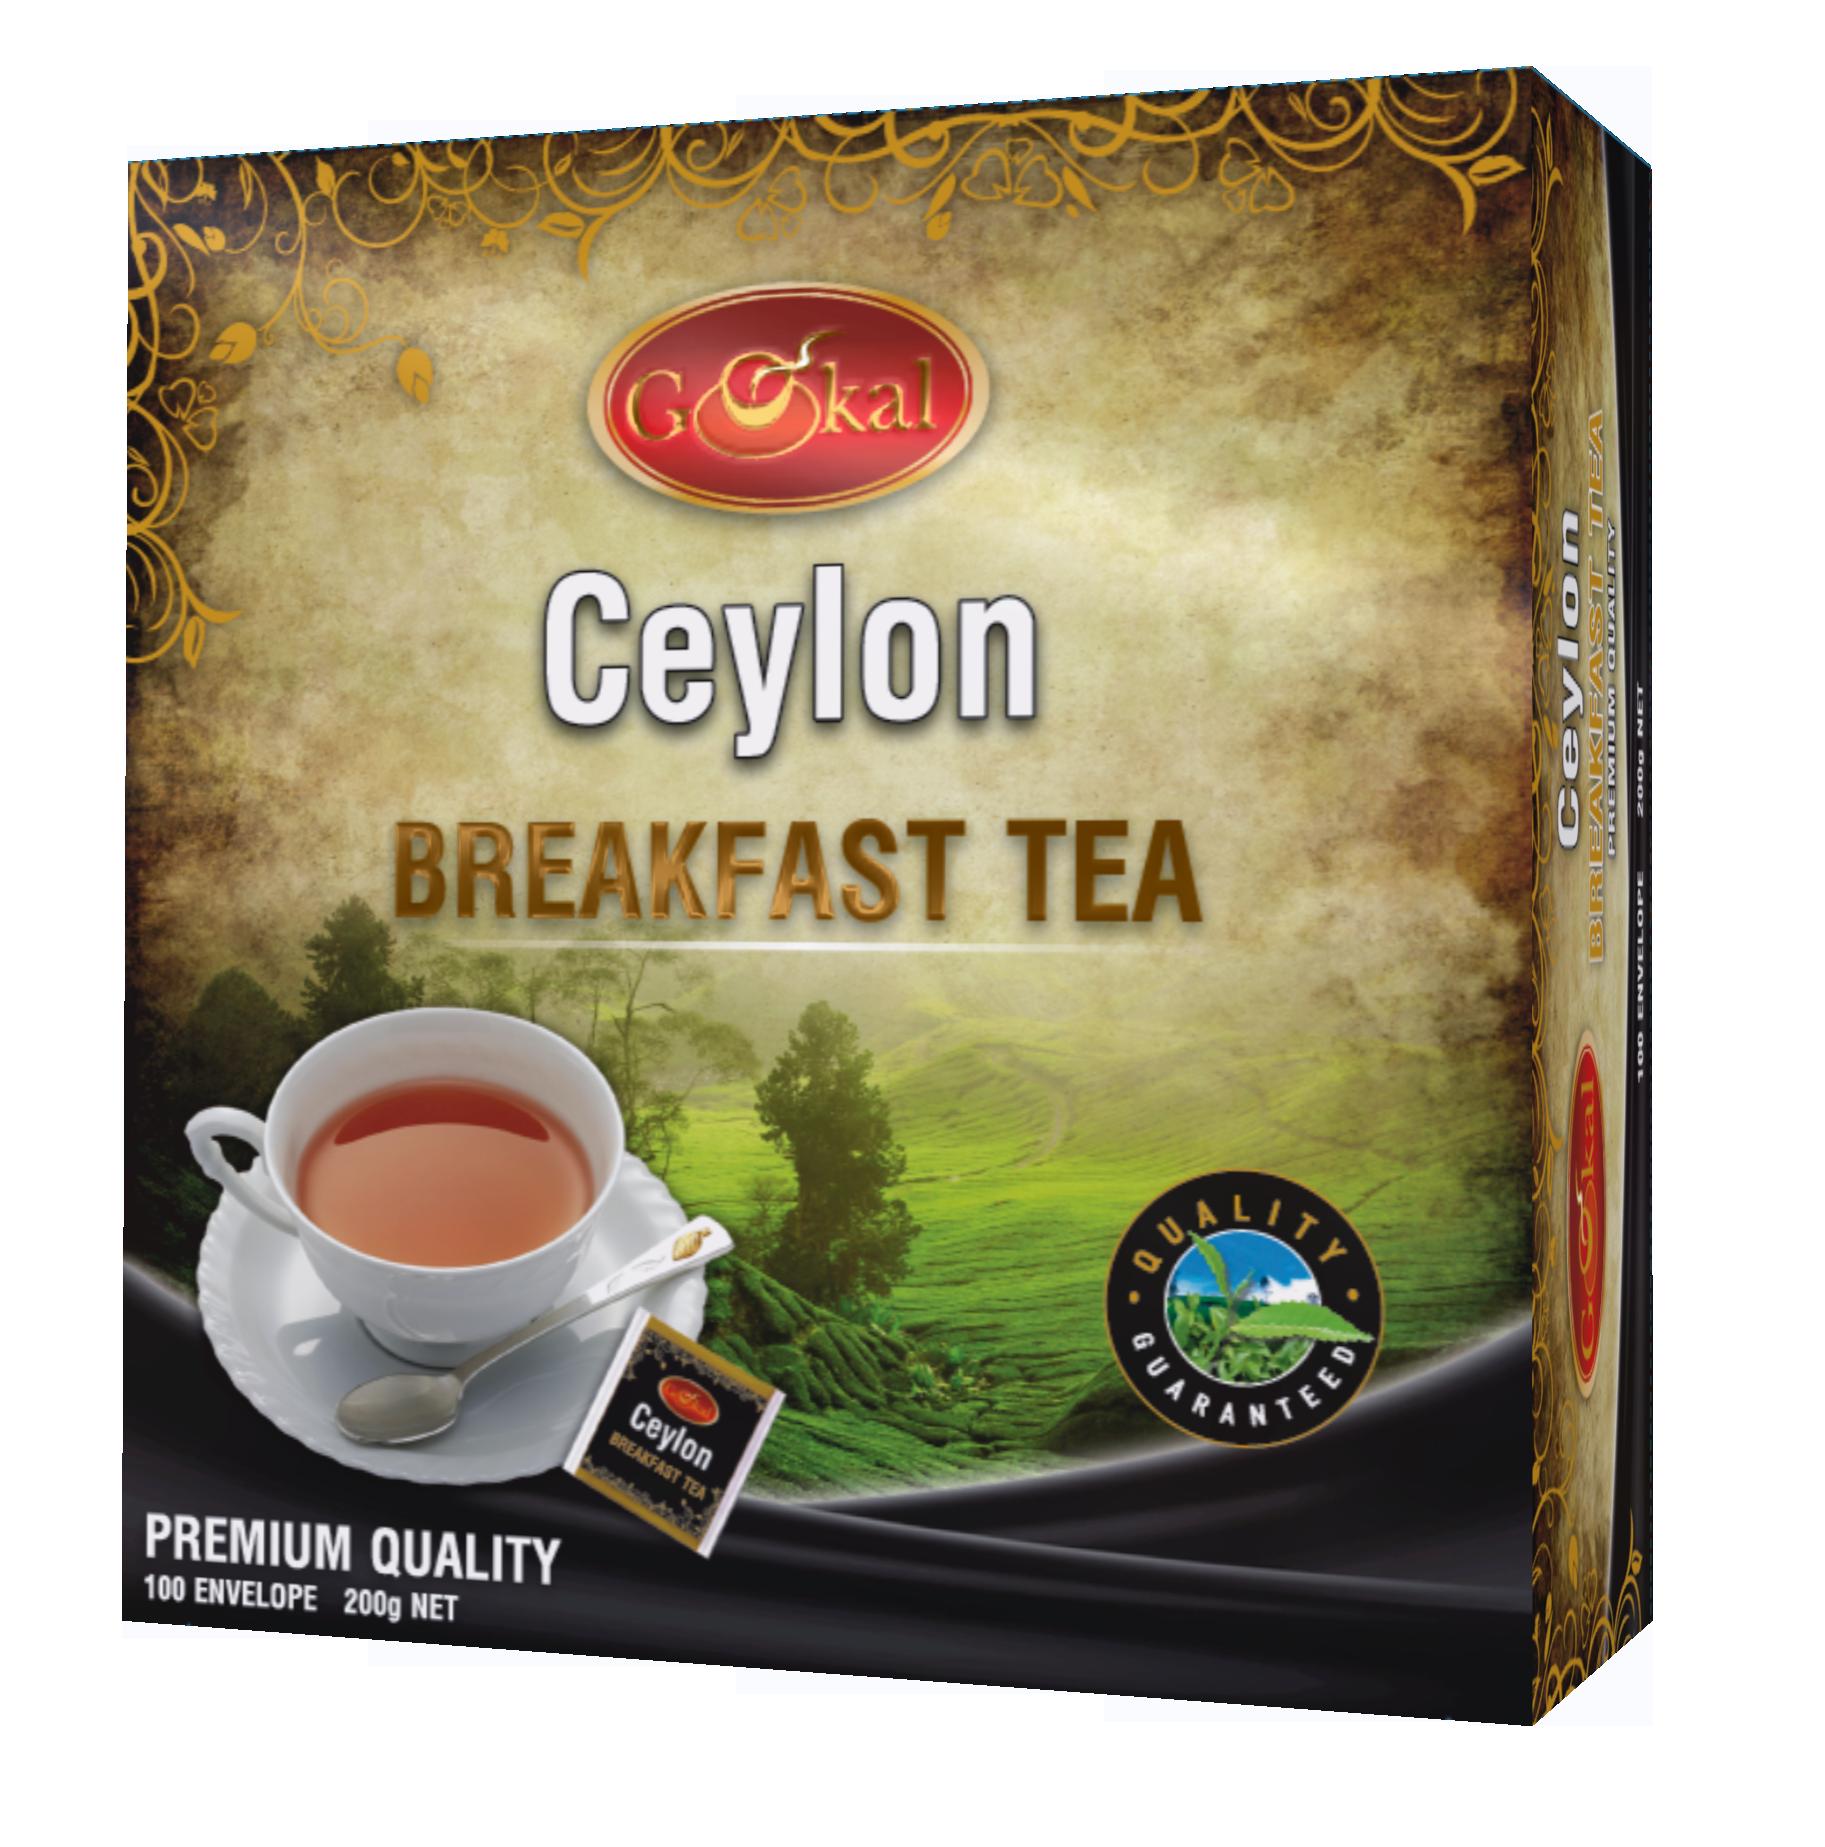 Gokal Flavor Tea Flavored Tea Tea Brands Ceylon Tea